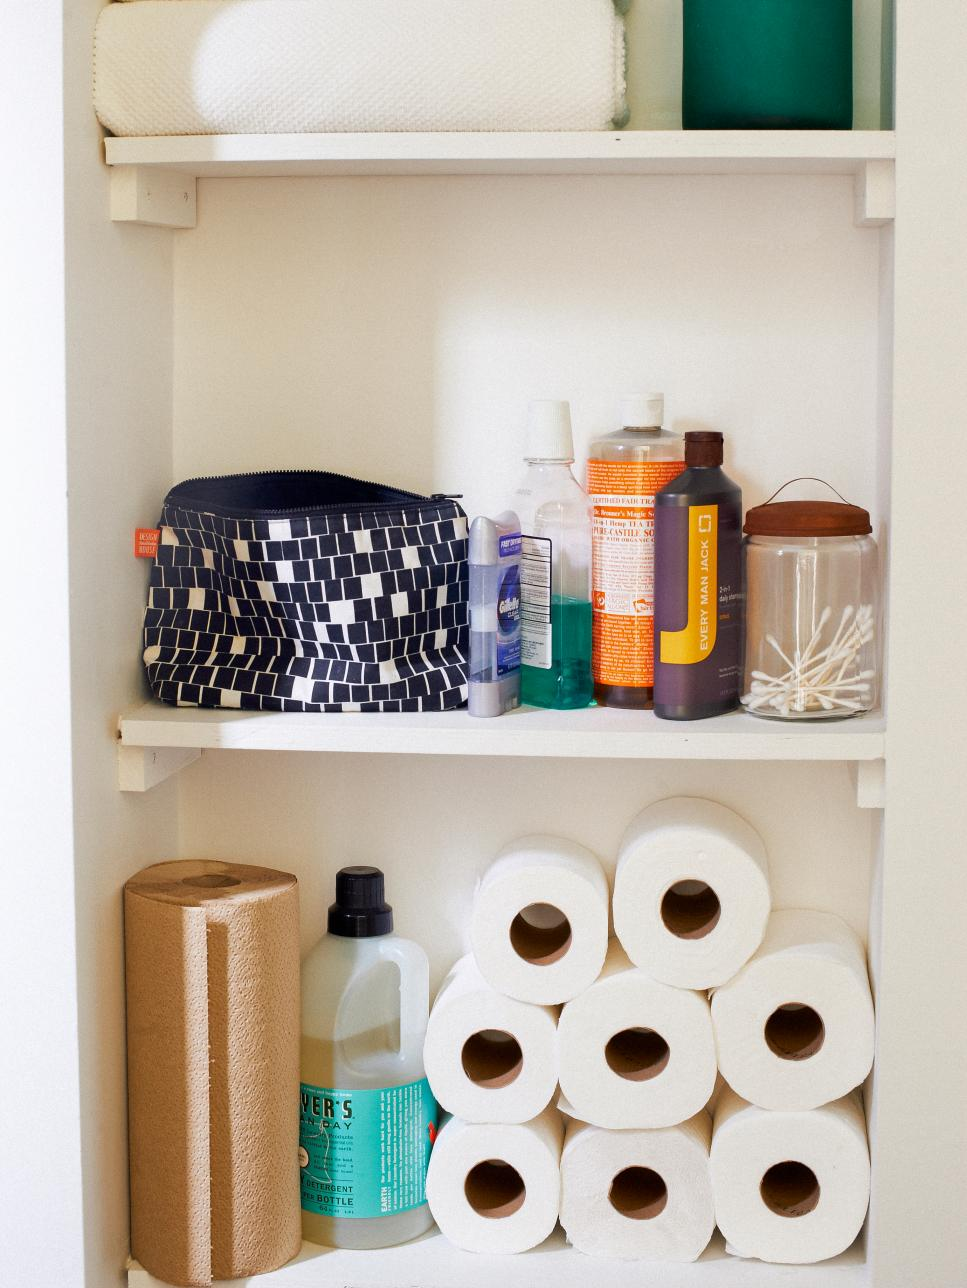 How To Organize A Small Bathroom Storage